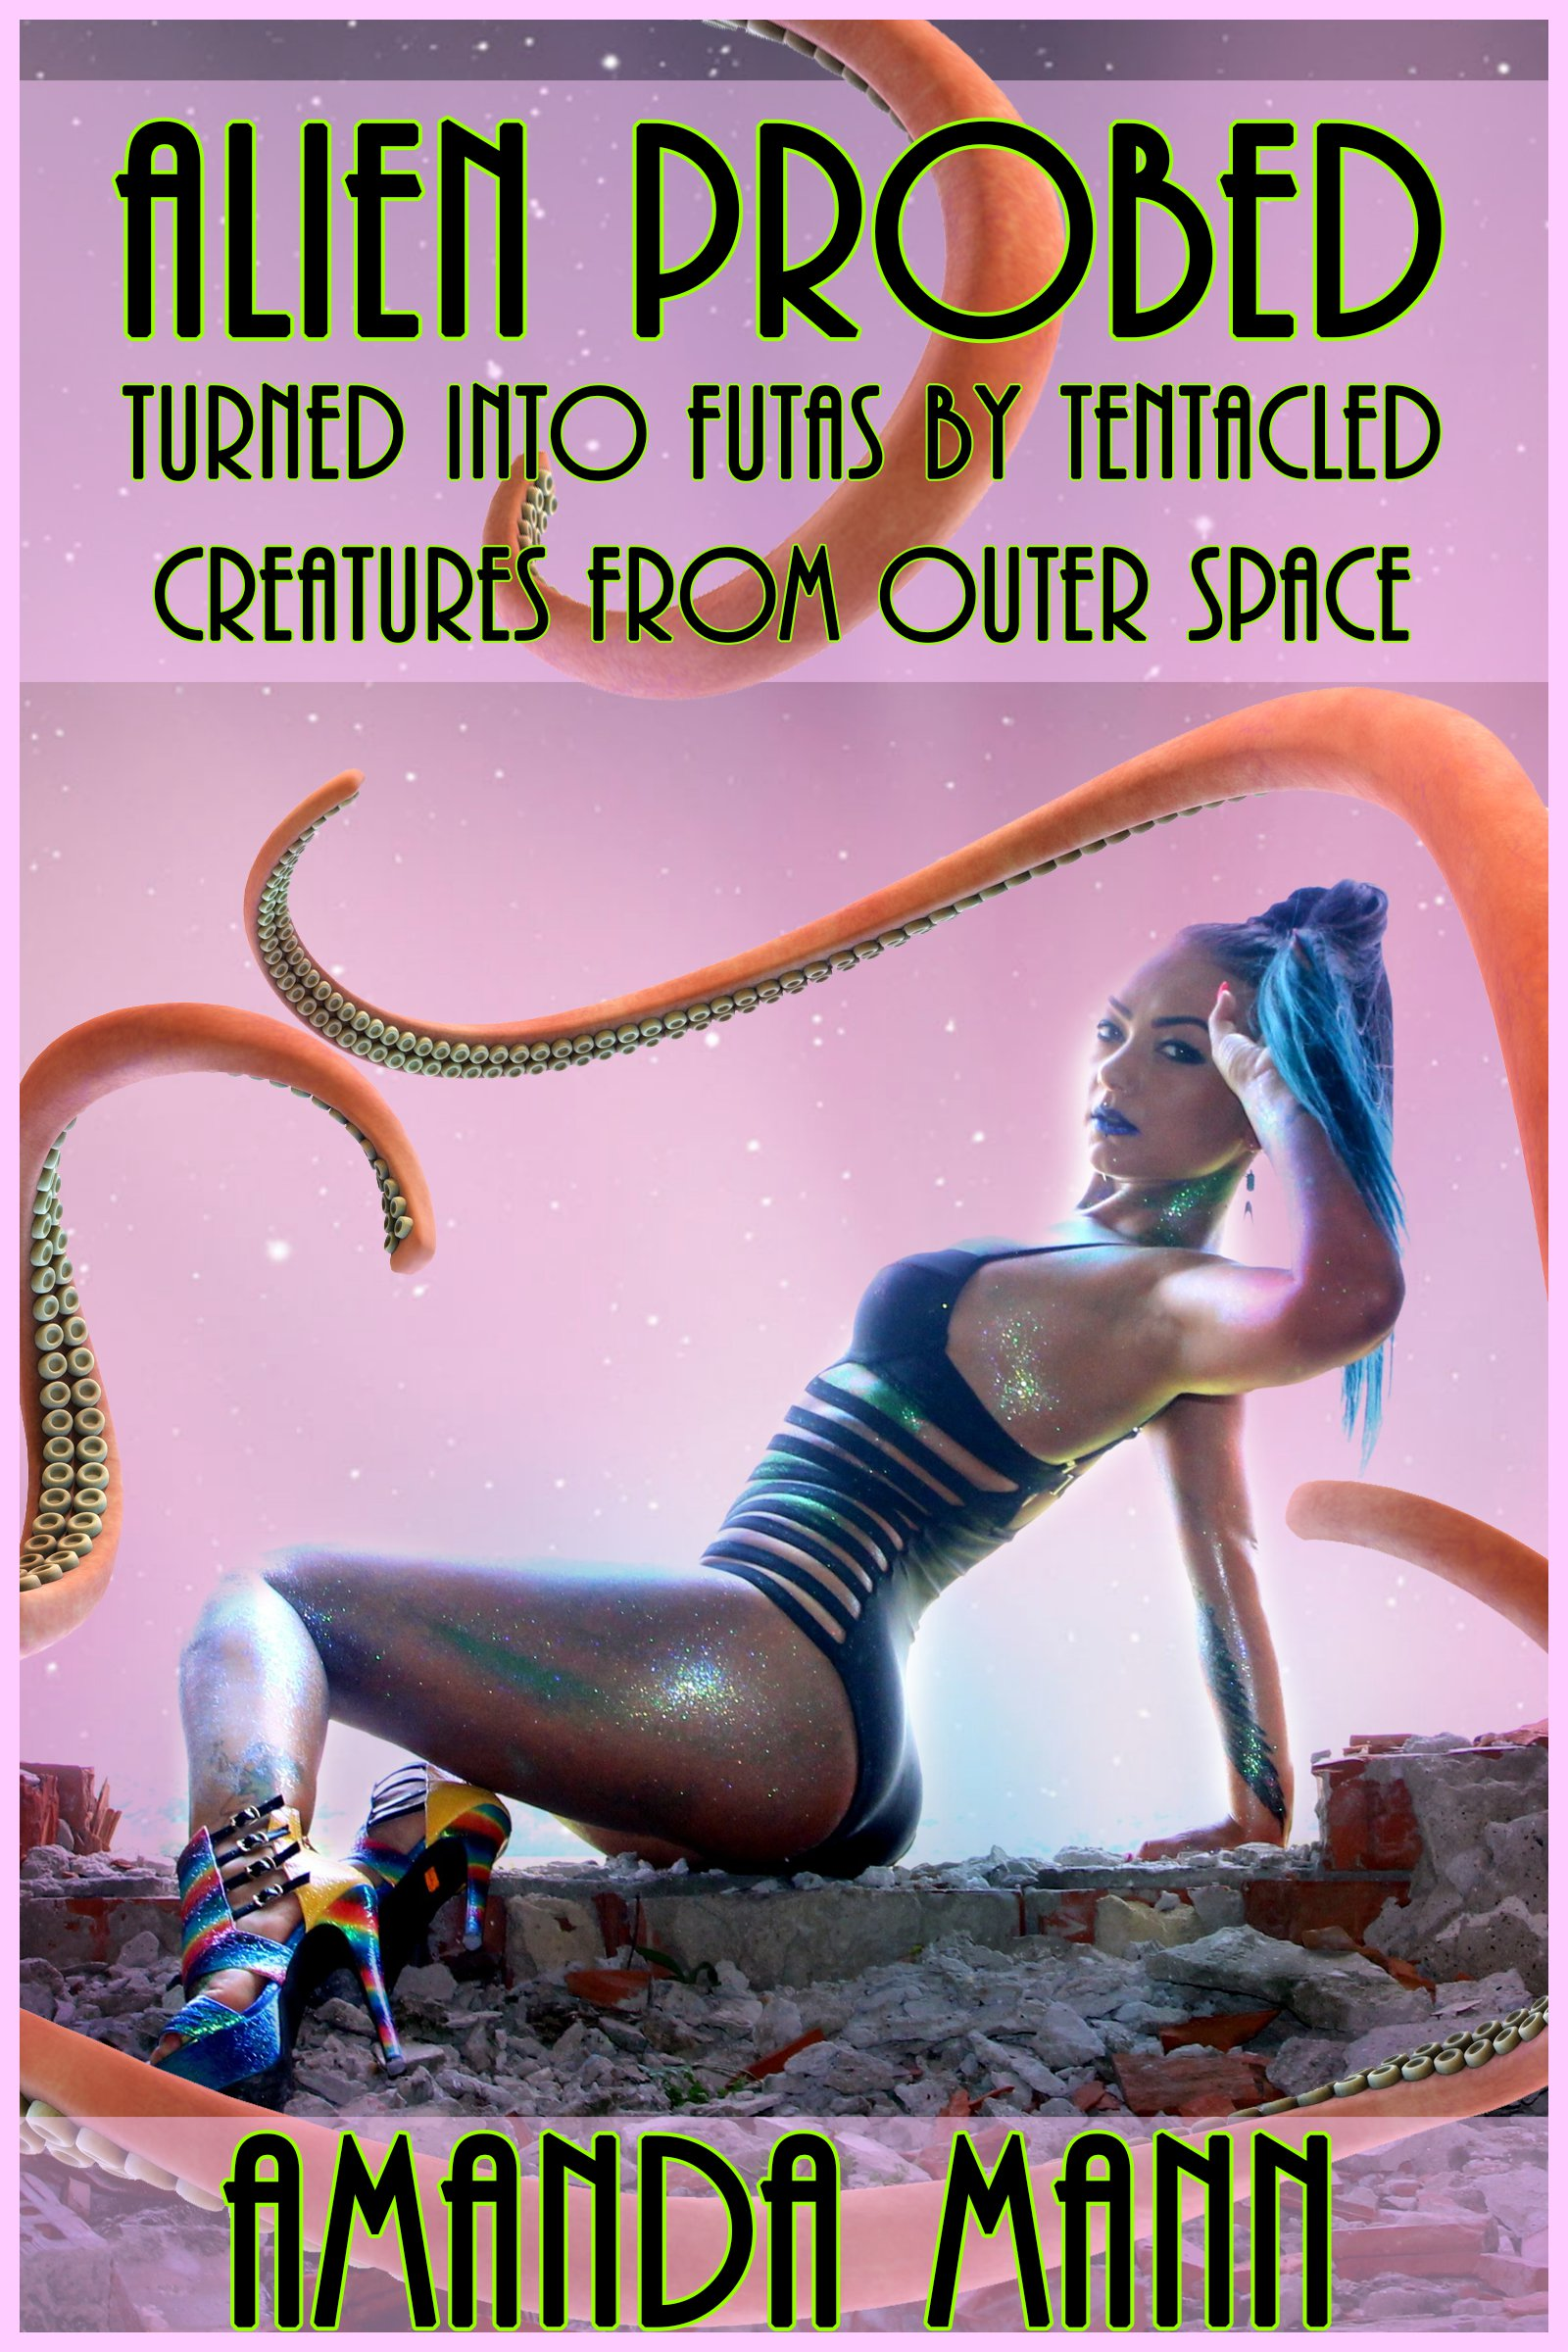 Alien Futanari alien probed: turned into futastentacled creatures from outer space, an  ebookamanda mann